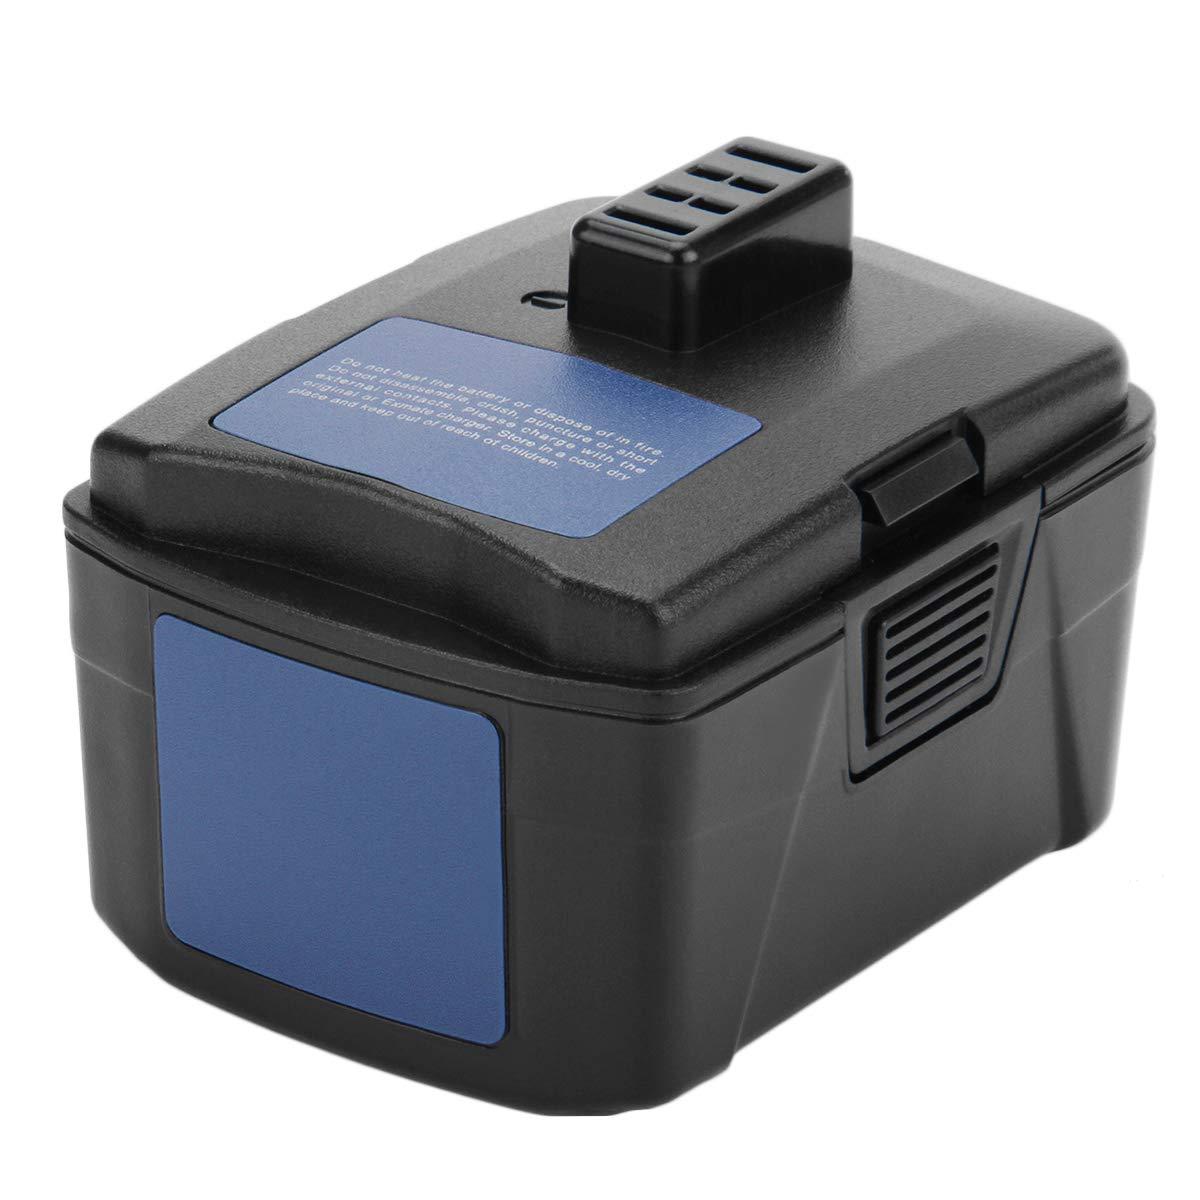 Exmate 12V 5.0Ah Lithium Ion Battery for Ryobi Ryobi CB120L CB121L BPL-1220 130503001 130503005 (NOT for CB120N)